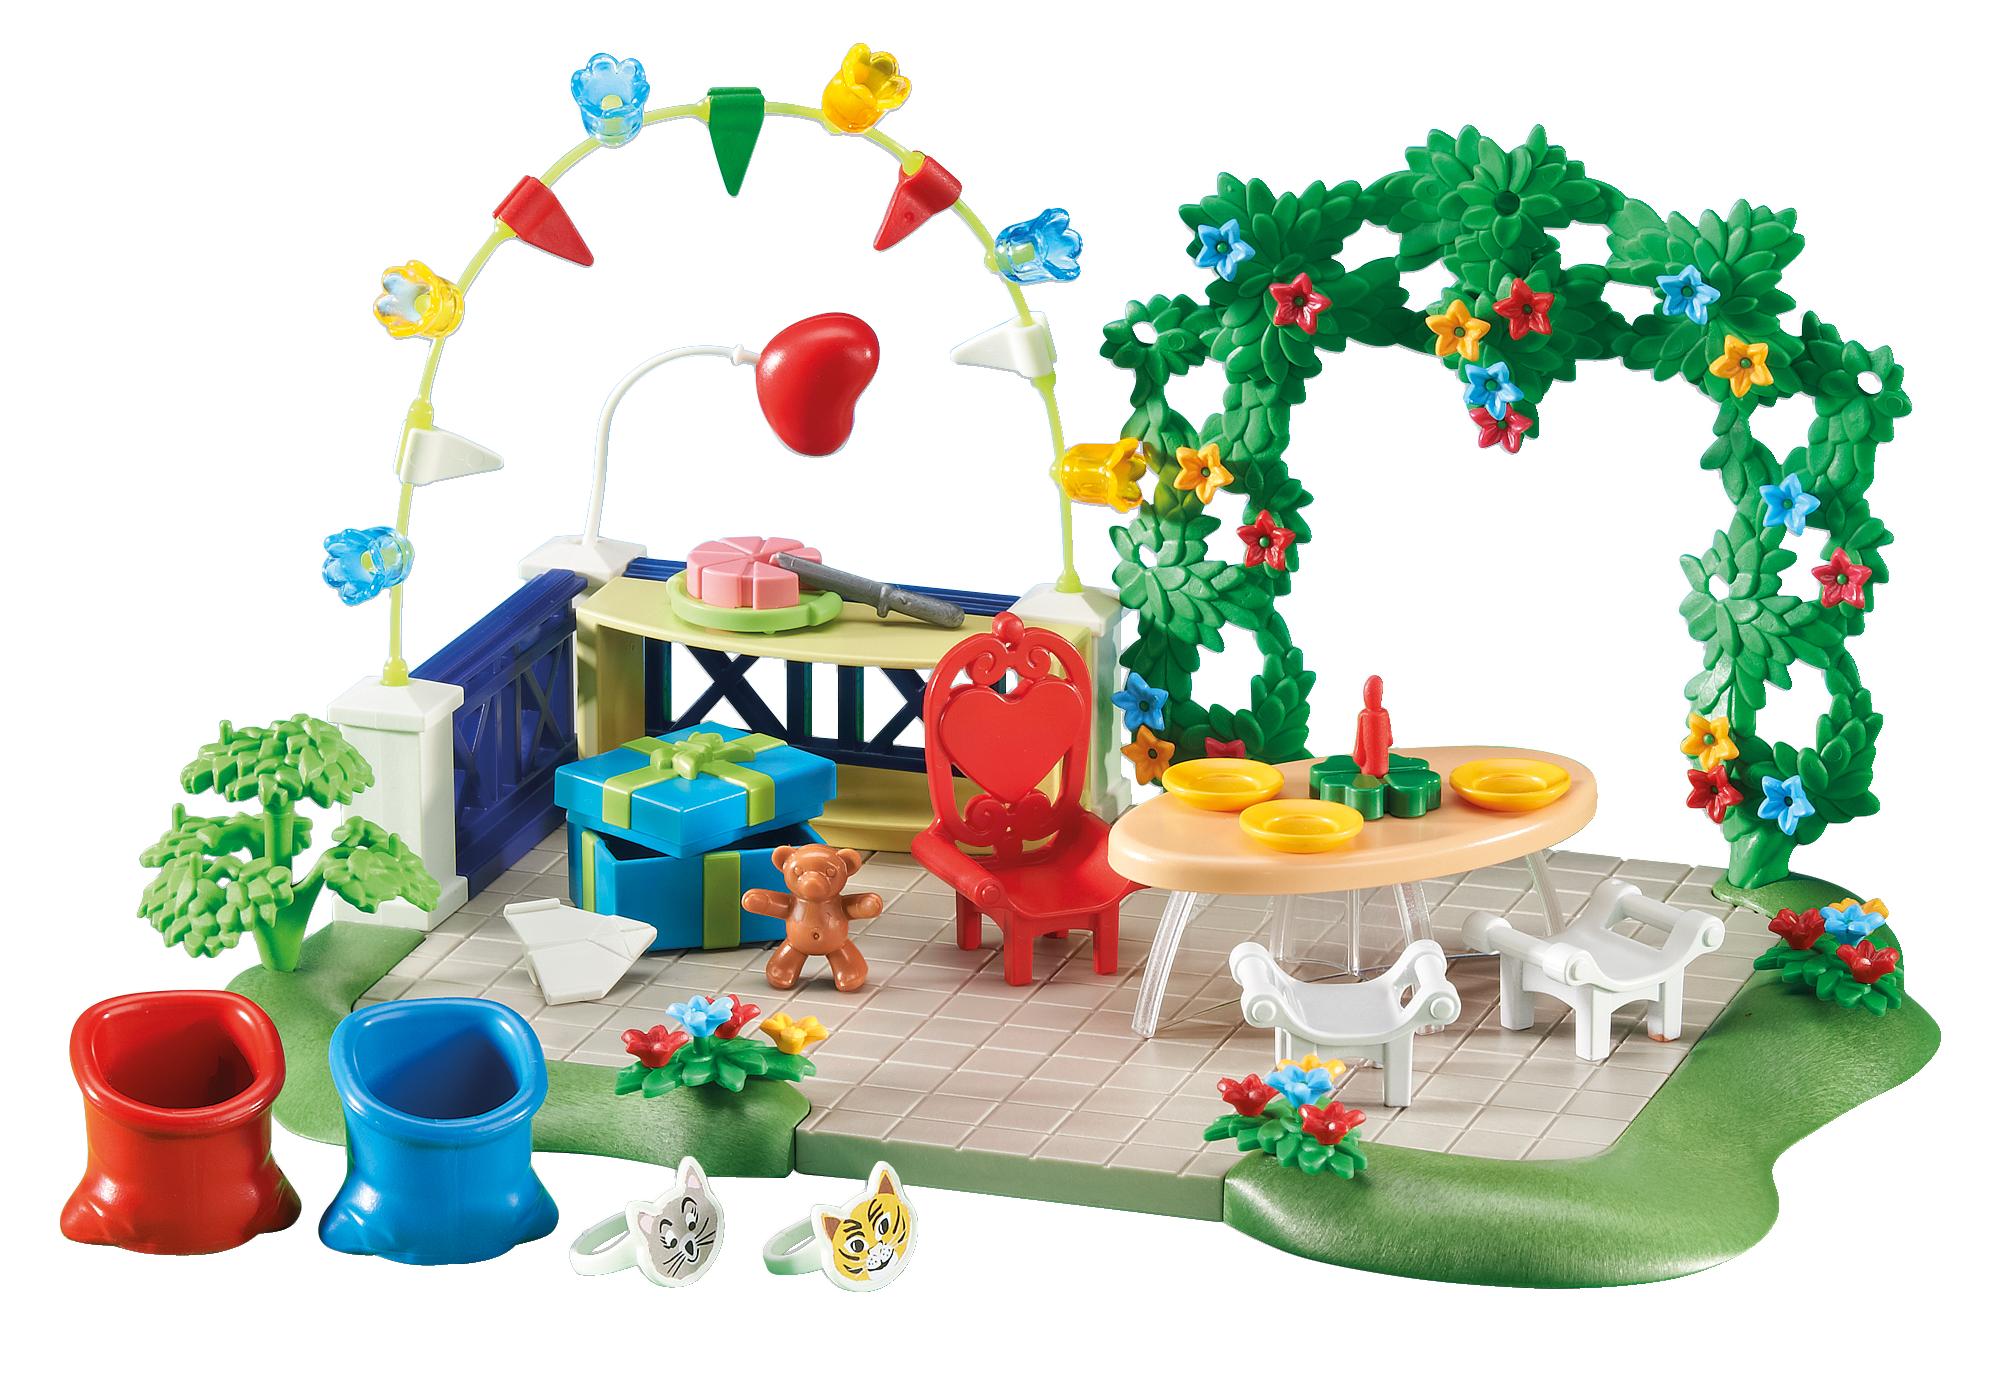 http://media.playmobil.com/i/playmobil/6438_product_detail/Kindergeburtstag-Set